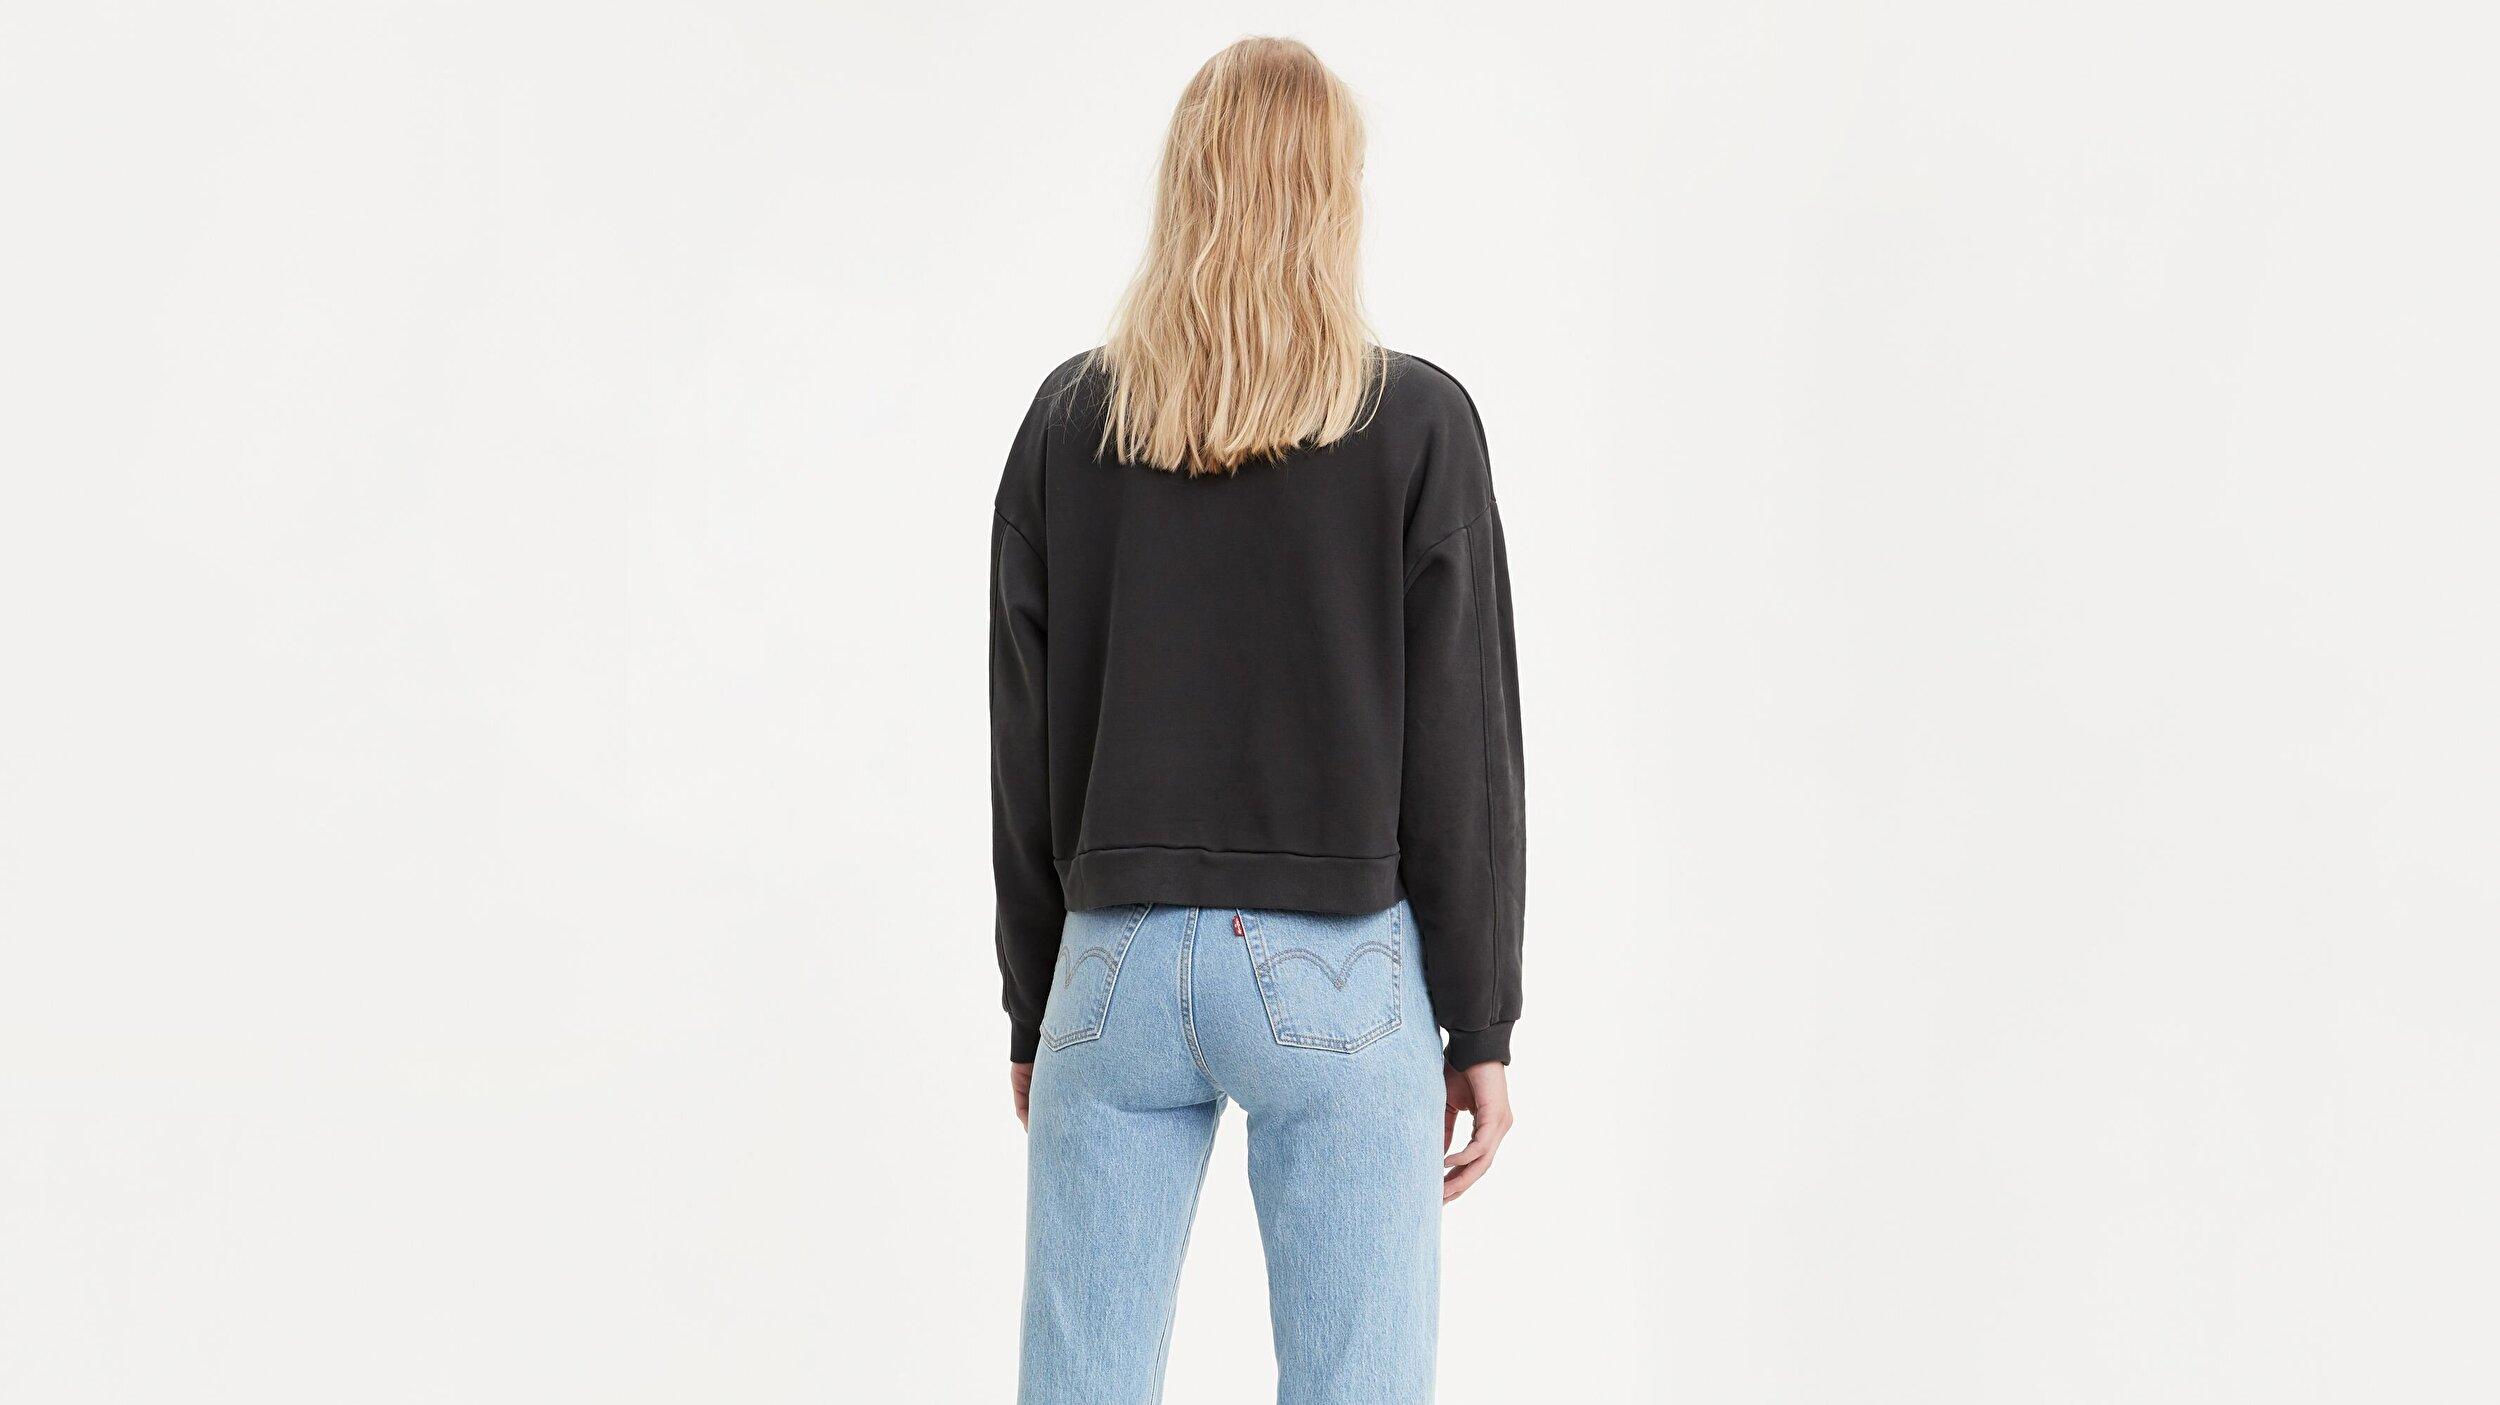 Diana Crew Ultra Soft Siyah Kadın Tişört